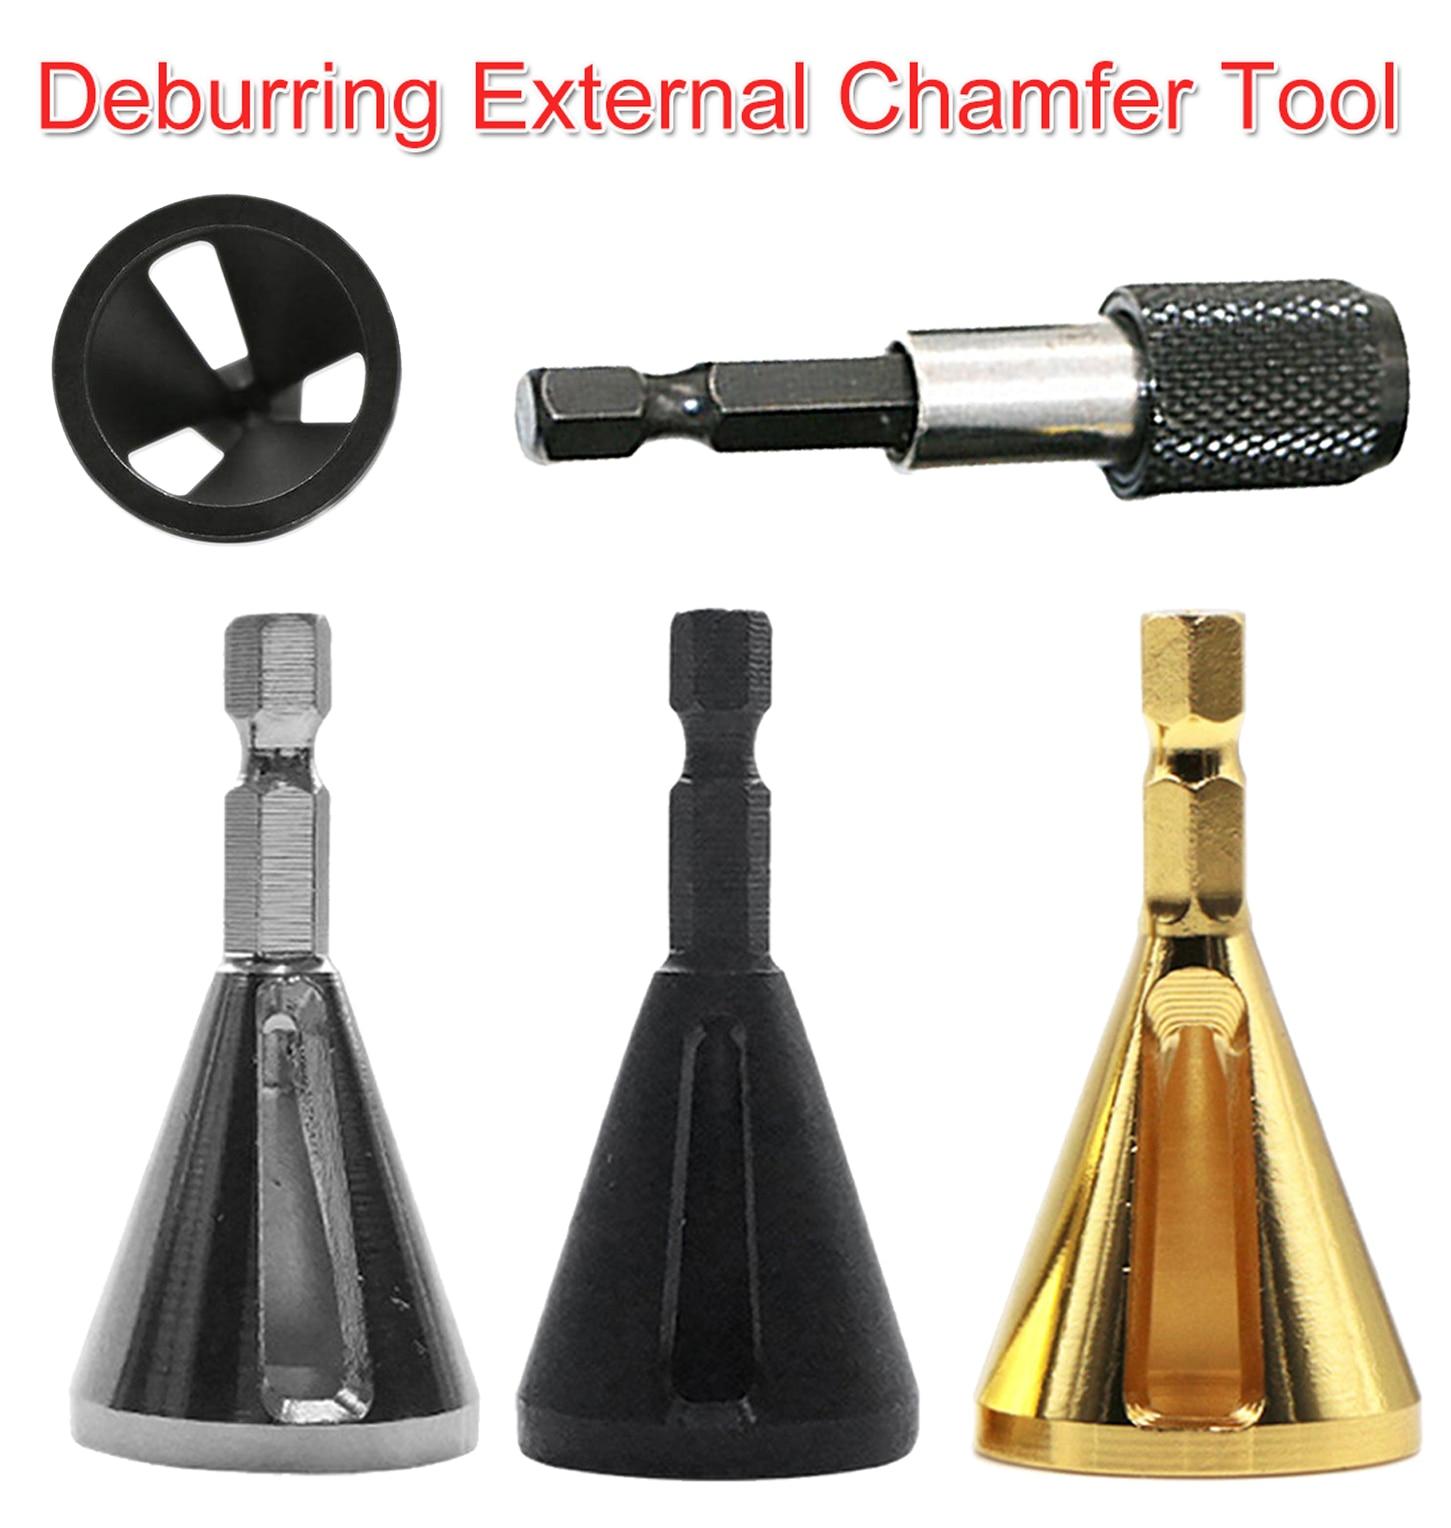 1/4 Hex Steel Deburring External Chamfer Tool High Strength Hardness Drill Bit Remove Burr For Stainless Steel/ Wood/ Plastic